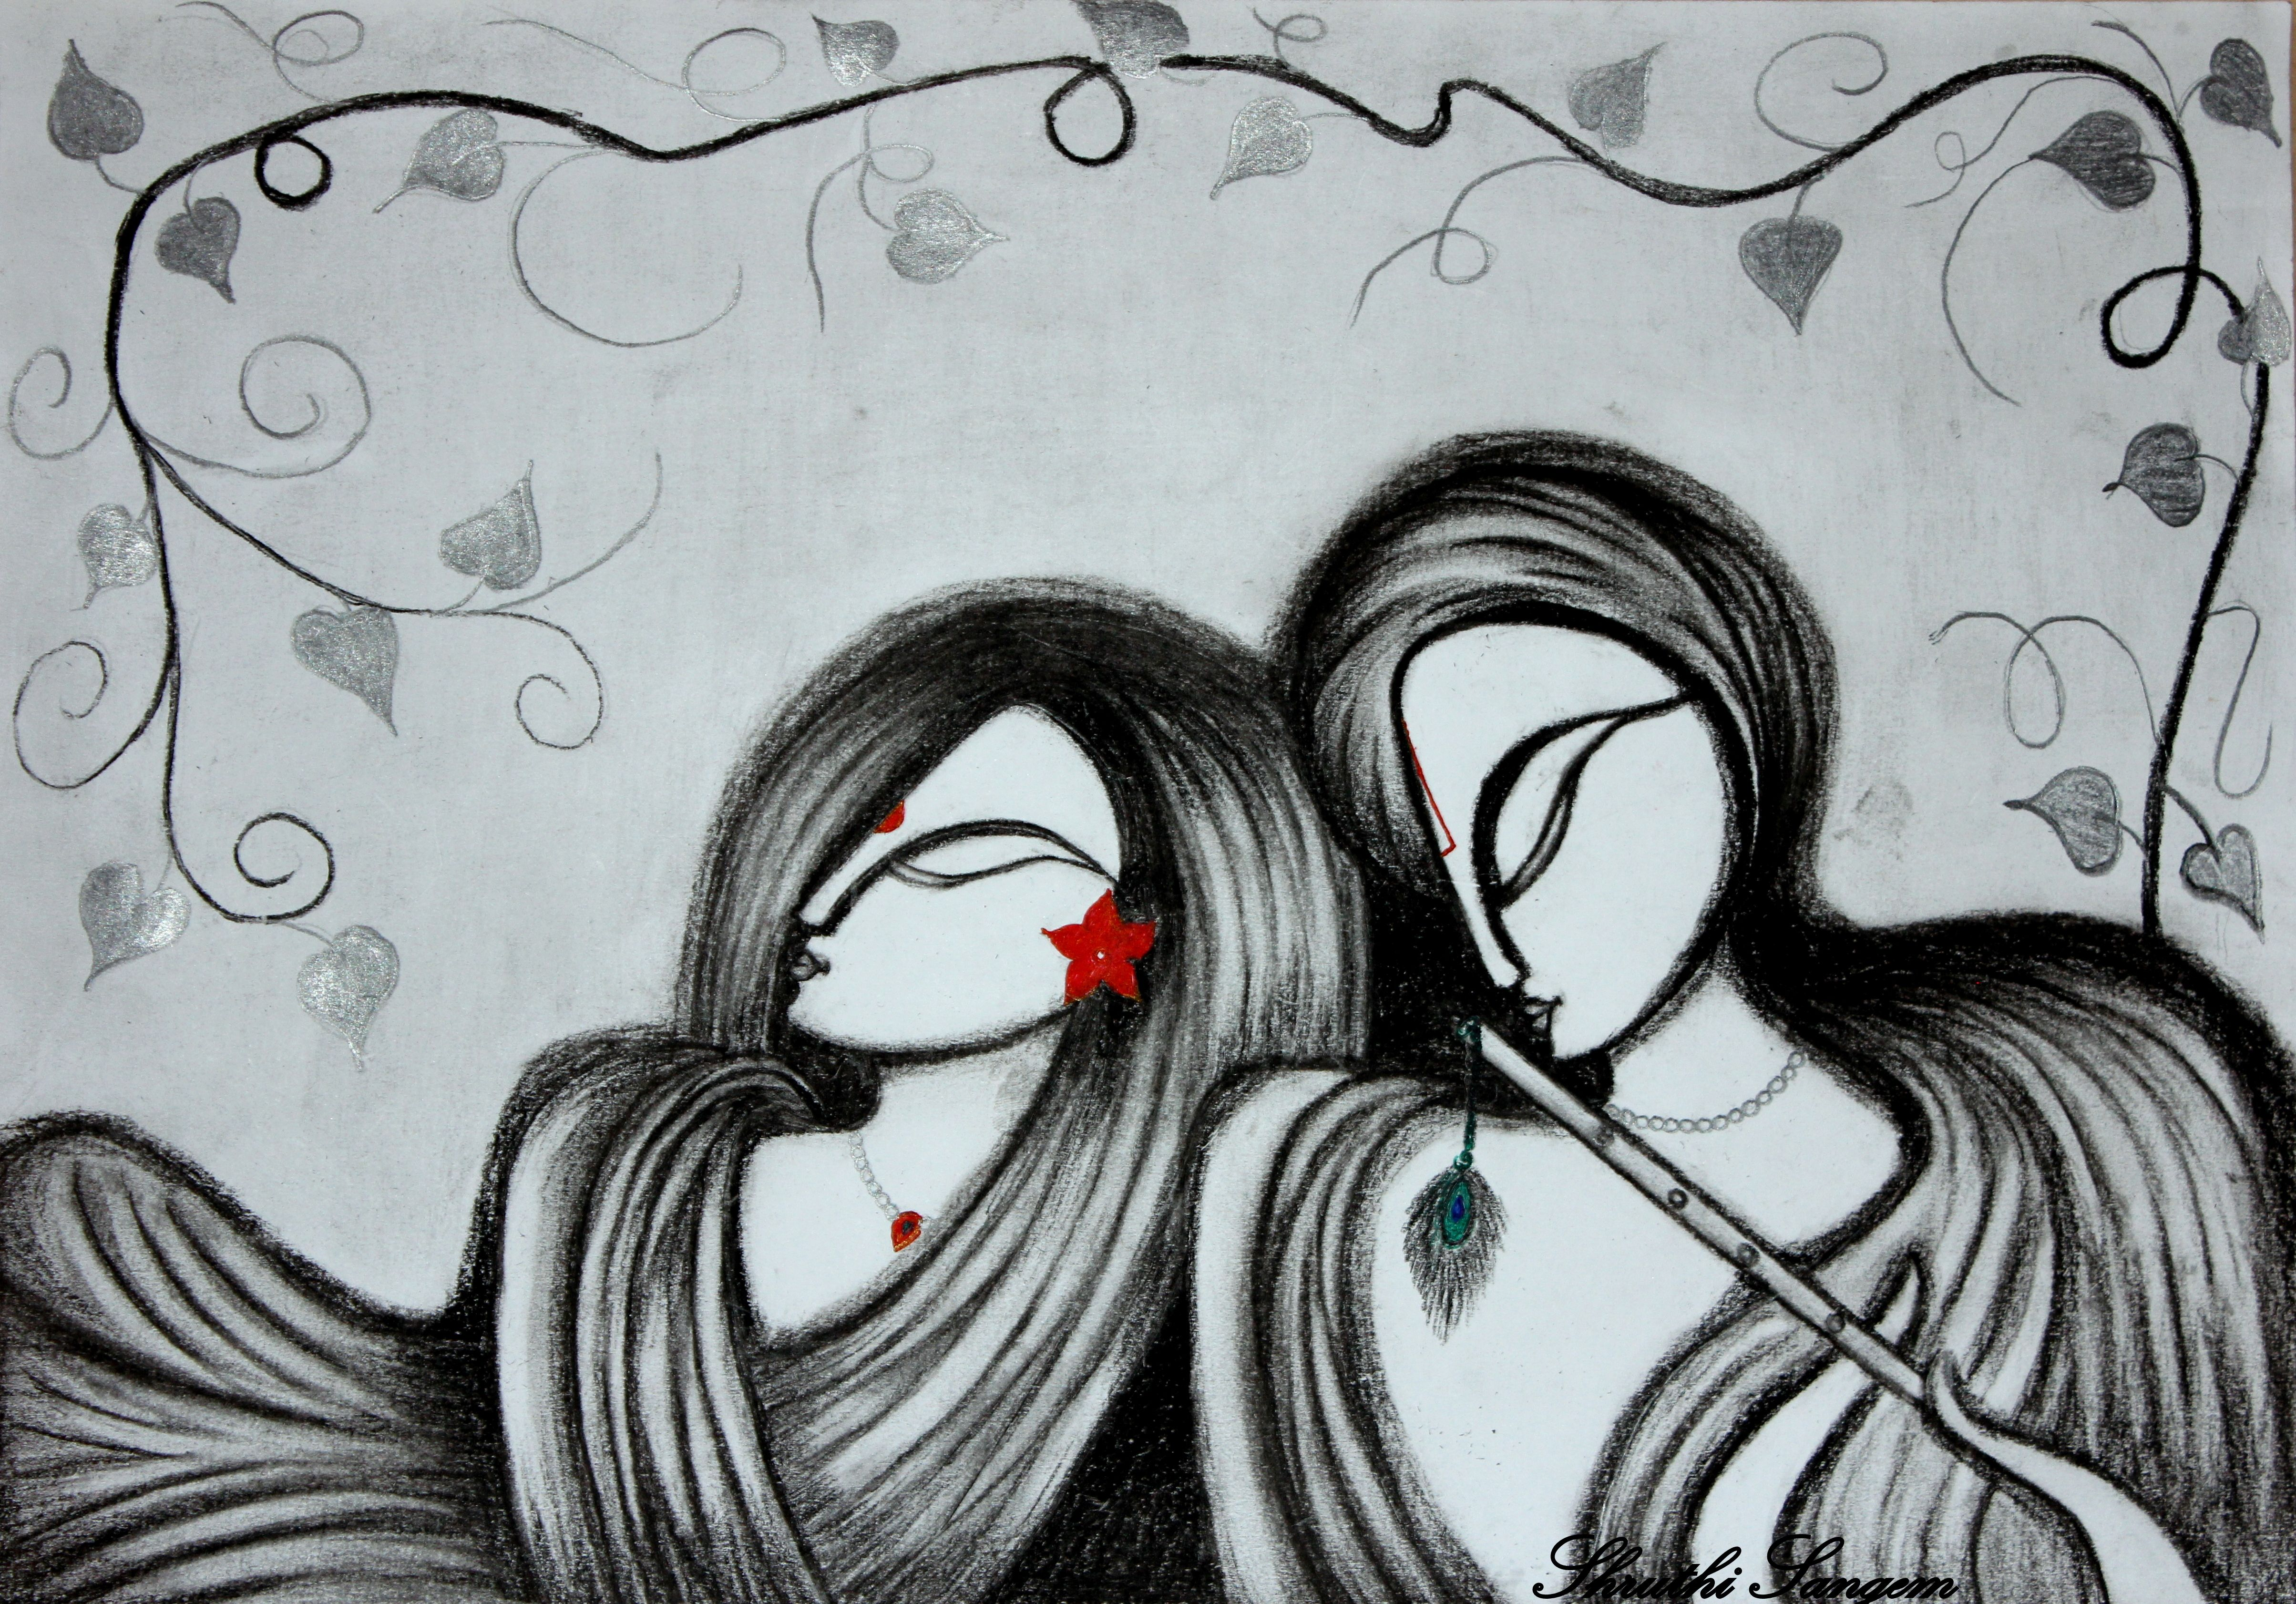 Radha krishna charcoal sketch